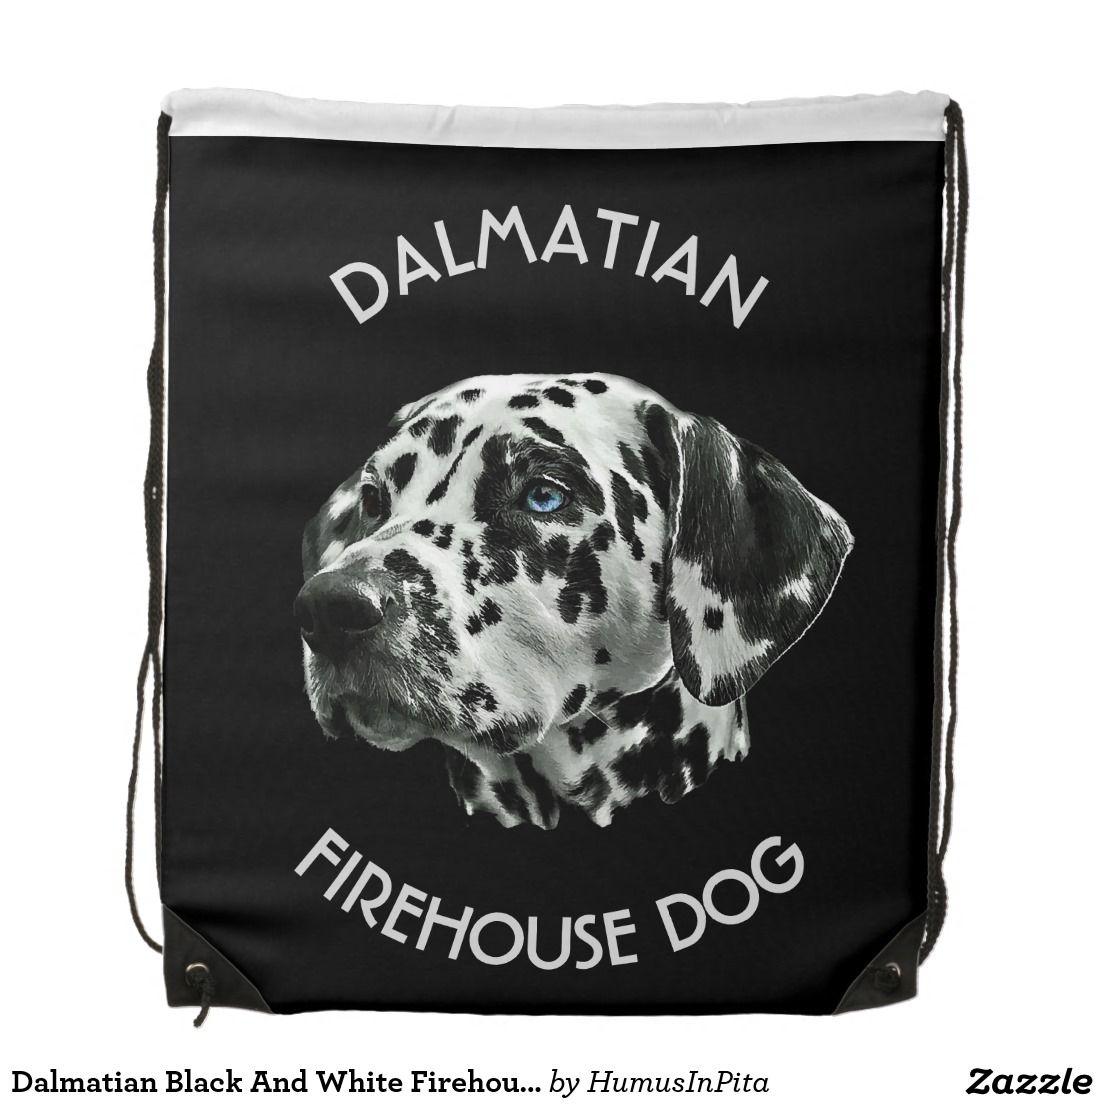 Dalmatian Black And White Firehouse Dog Drawstring Bag